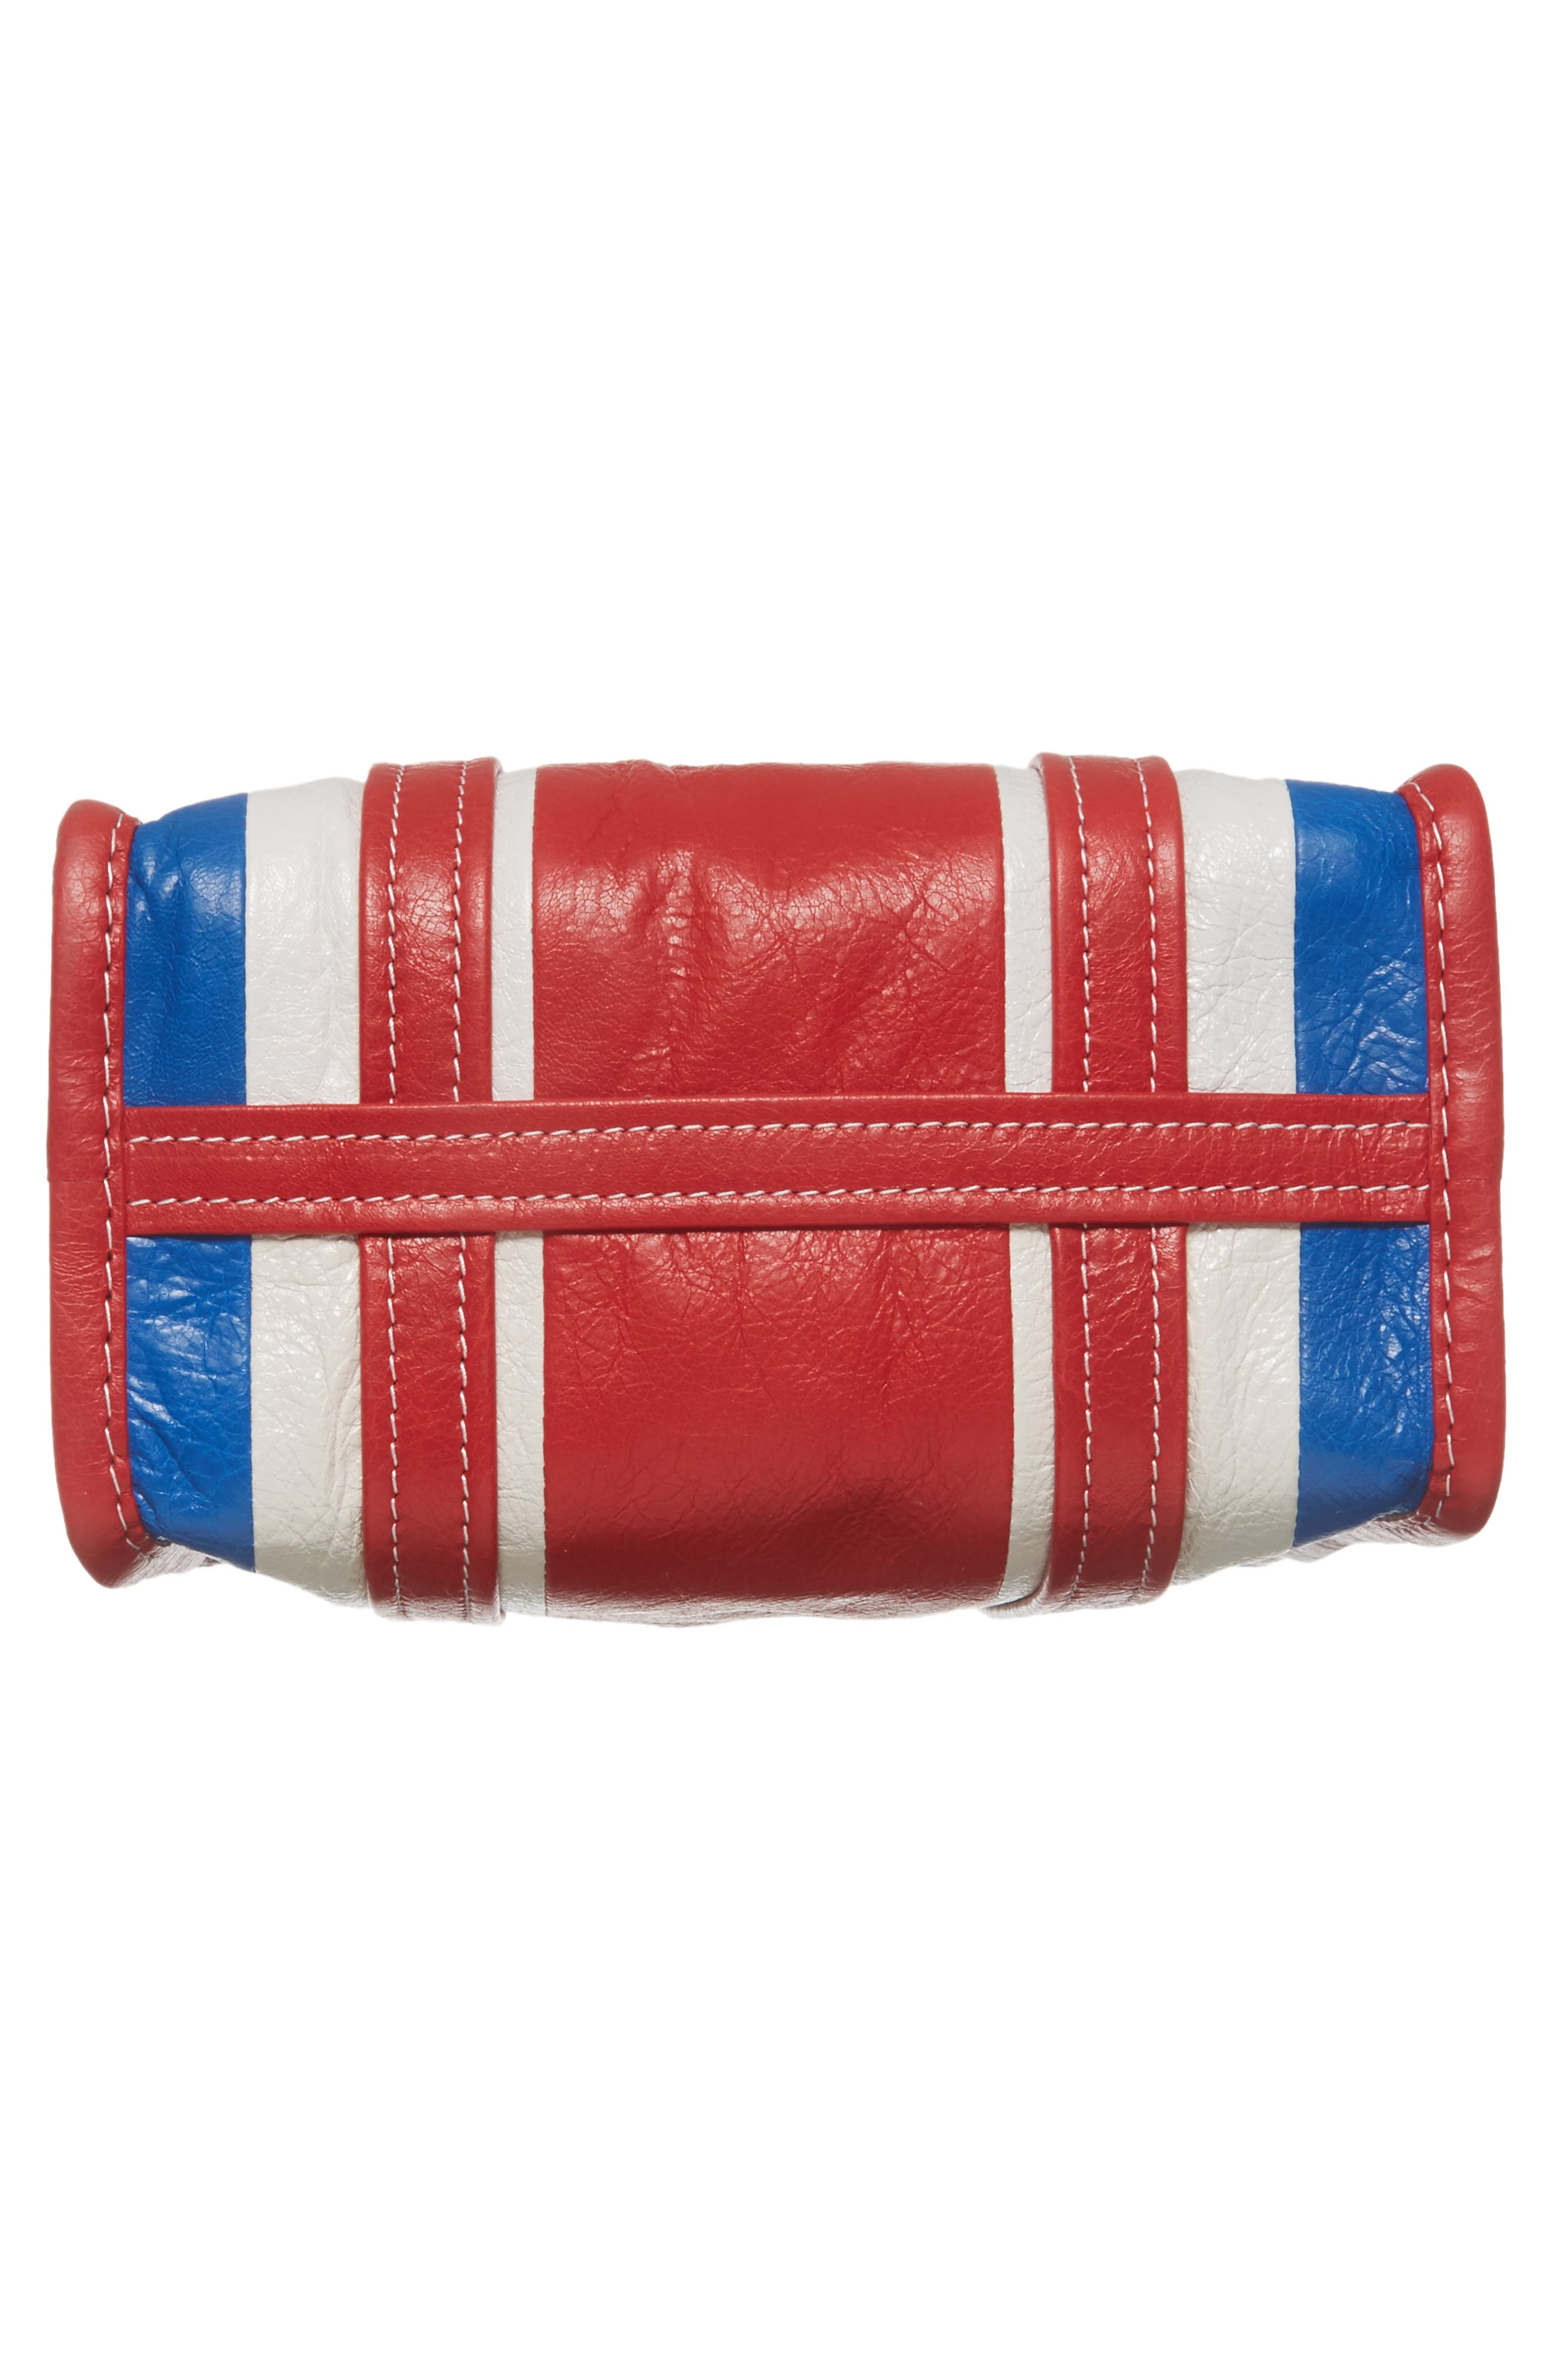 Extra Small Bazar Leather AJ Shopper,                             Alternate thumbnail 6, color,                             Blue/ Blanc/ Rouge